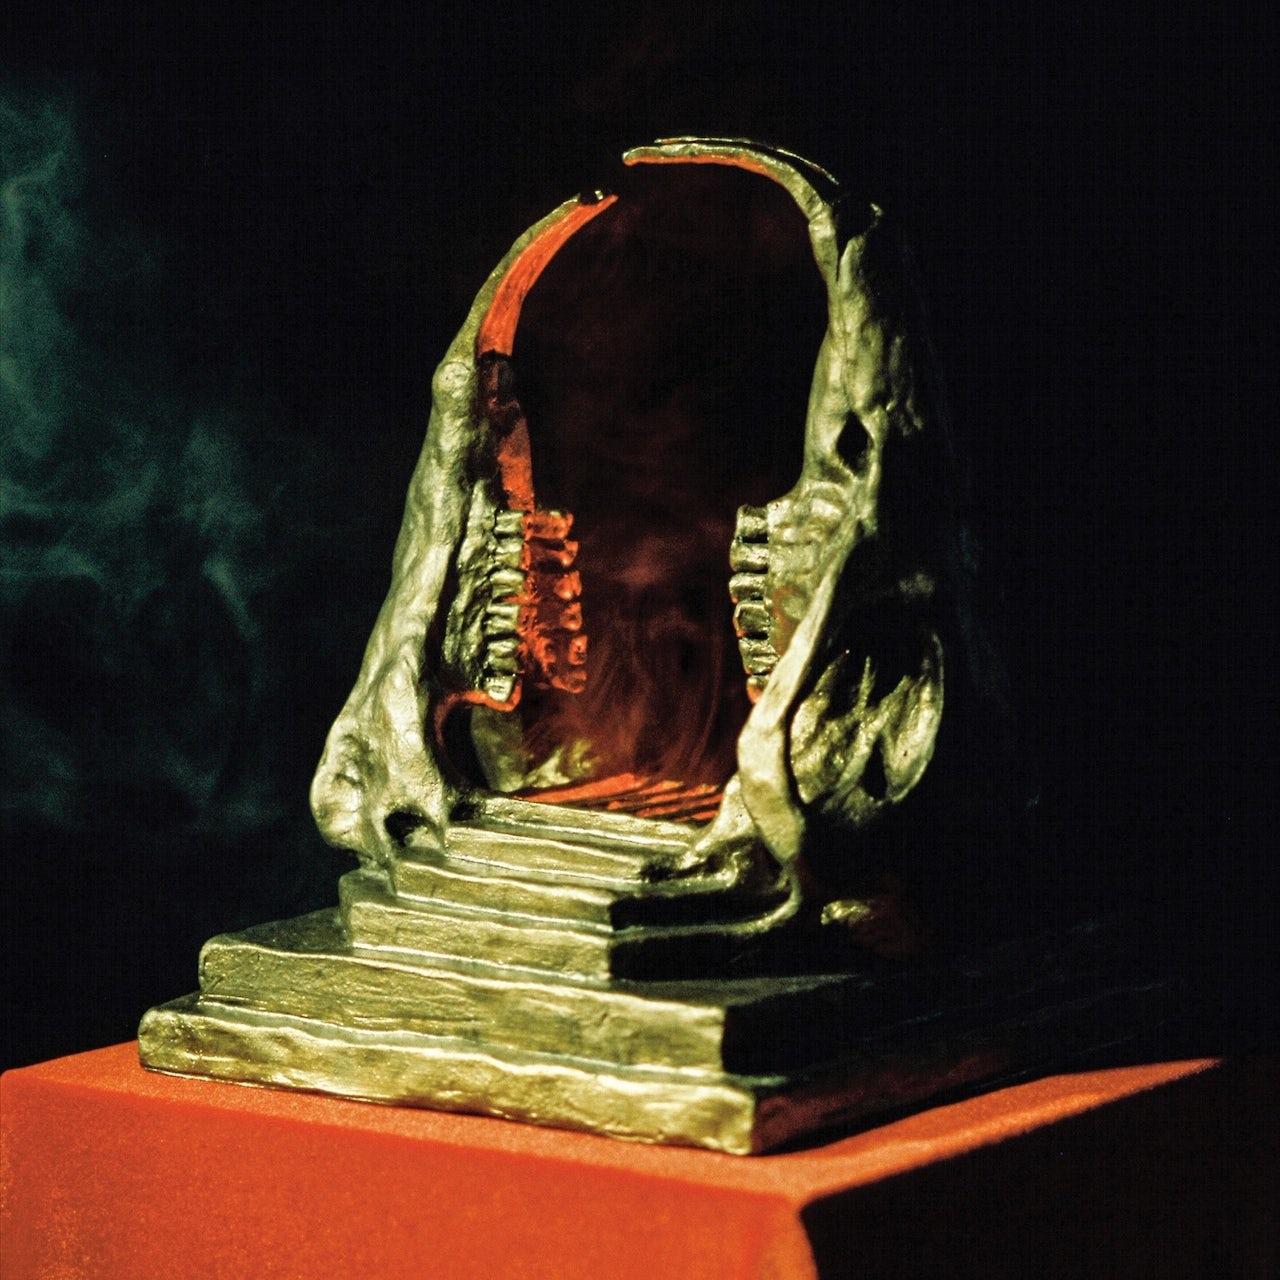 King Gizzard & The Lizard Wizard INFEST THE RATS NEST Vinyl Record